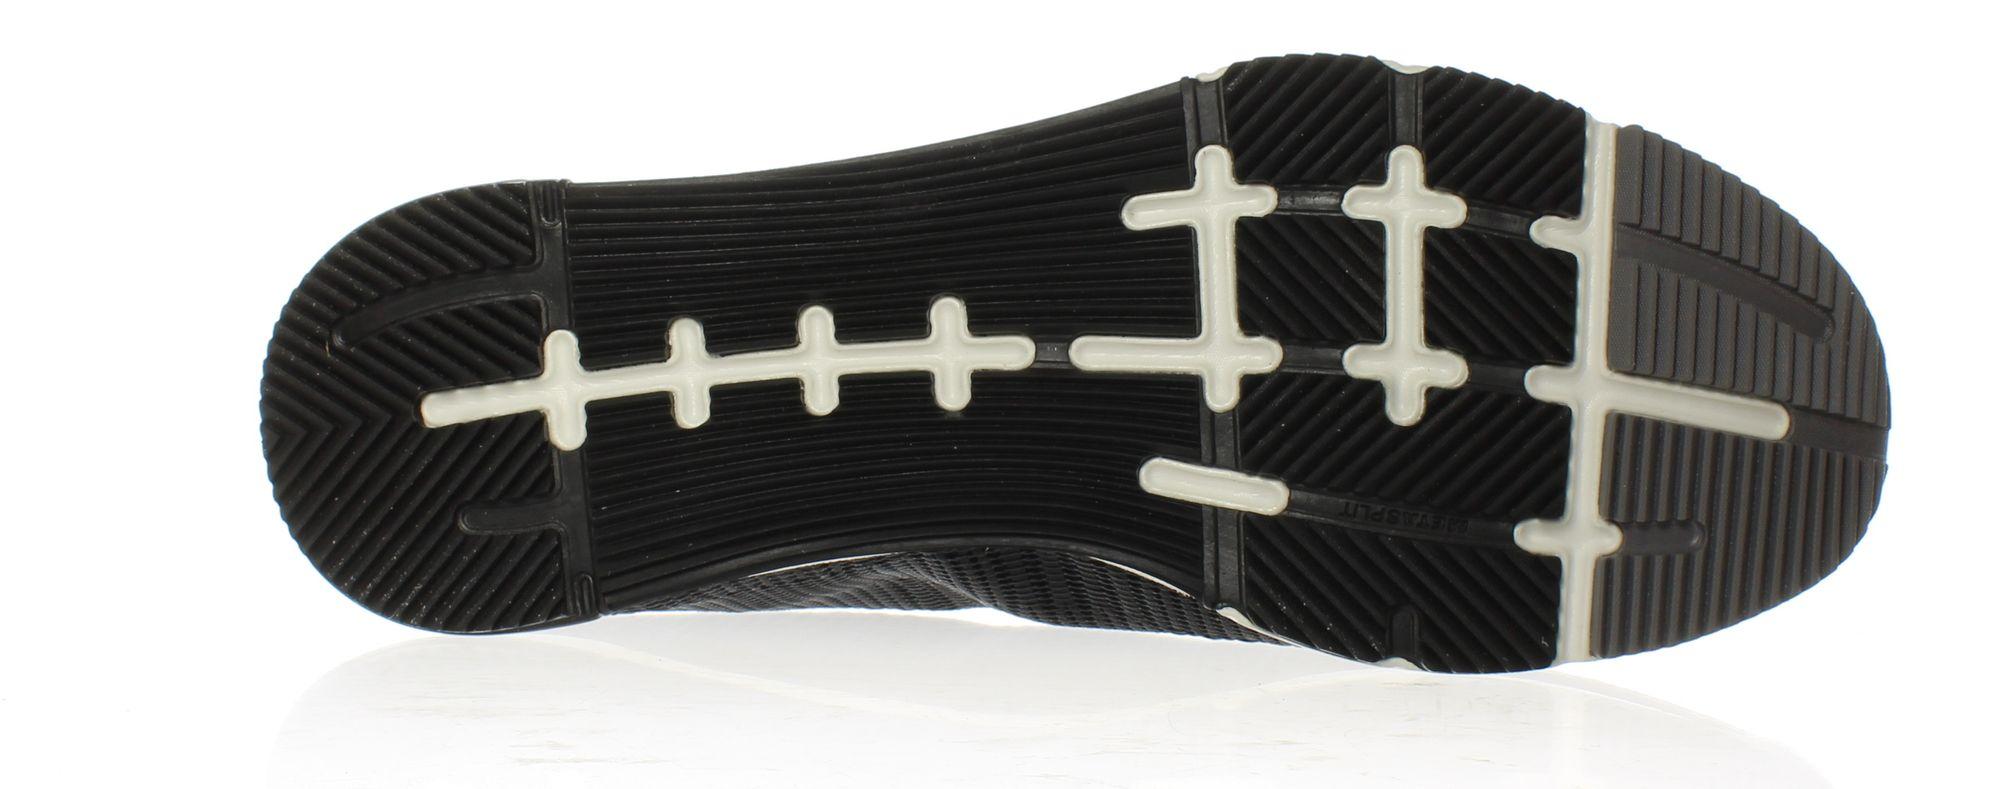 Reebok-Mens-Athletic-Speed-TR-Flexweave-Cross-Training-Shoes thumbnail 21